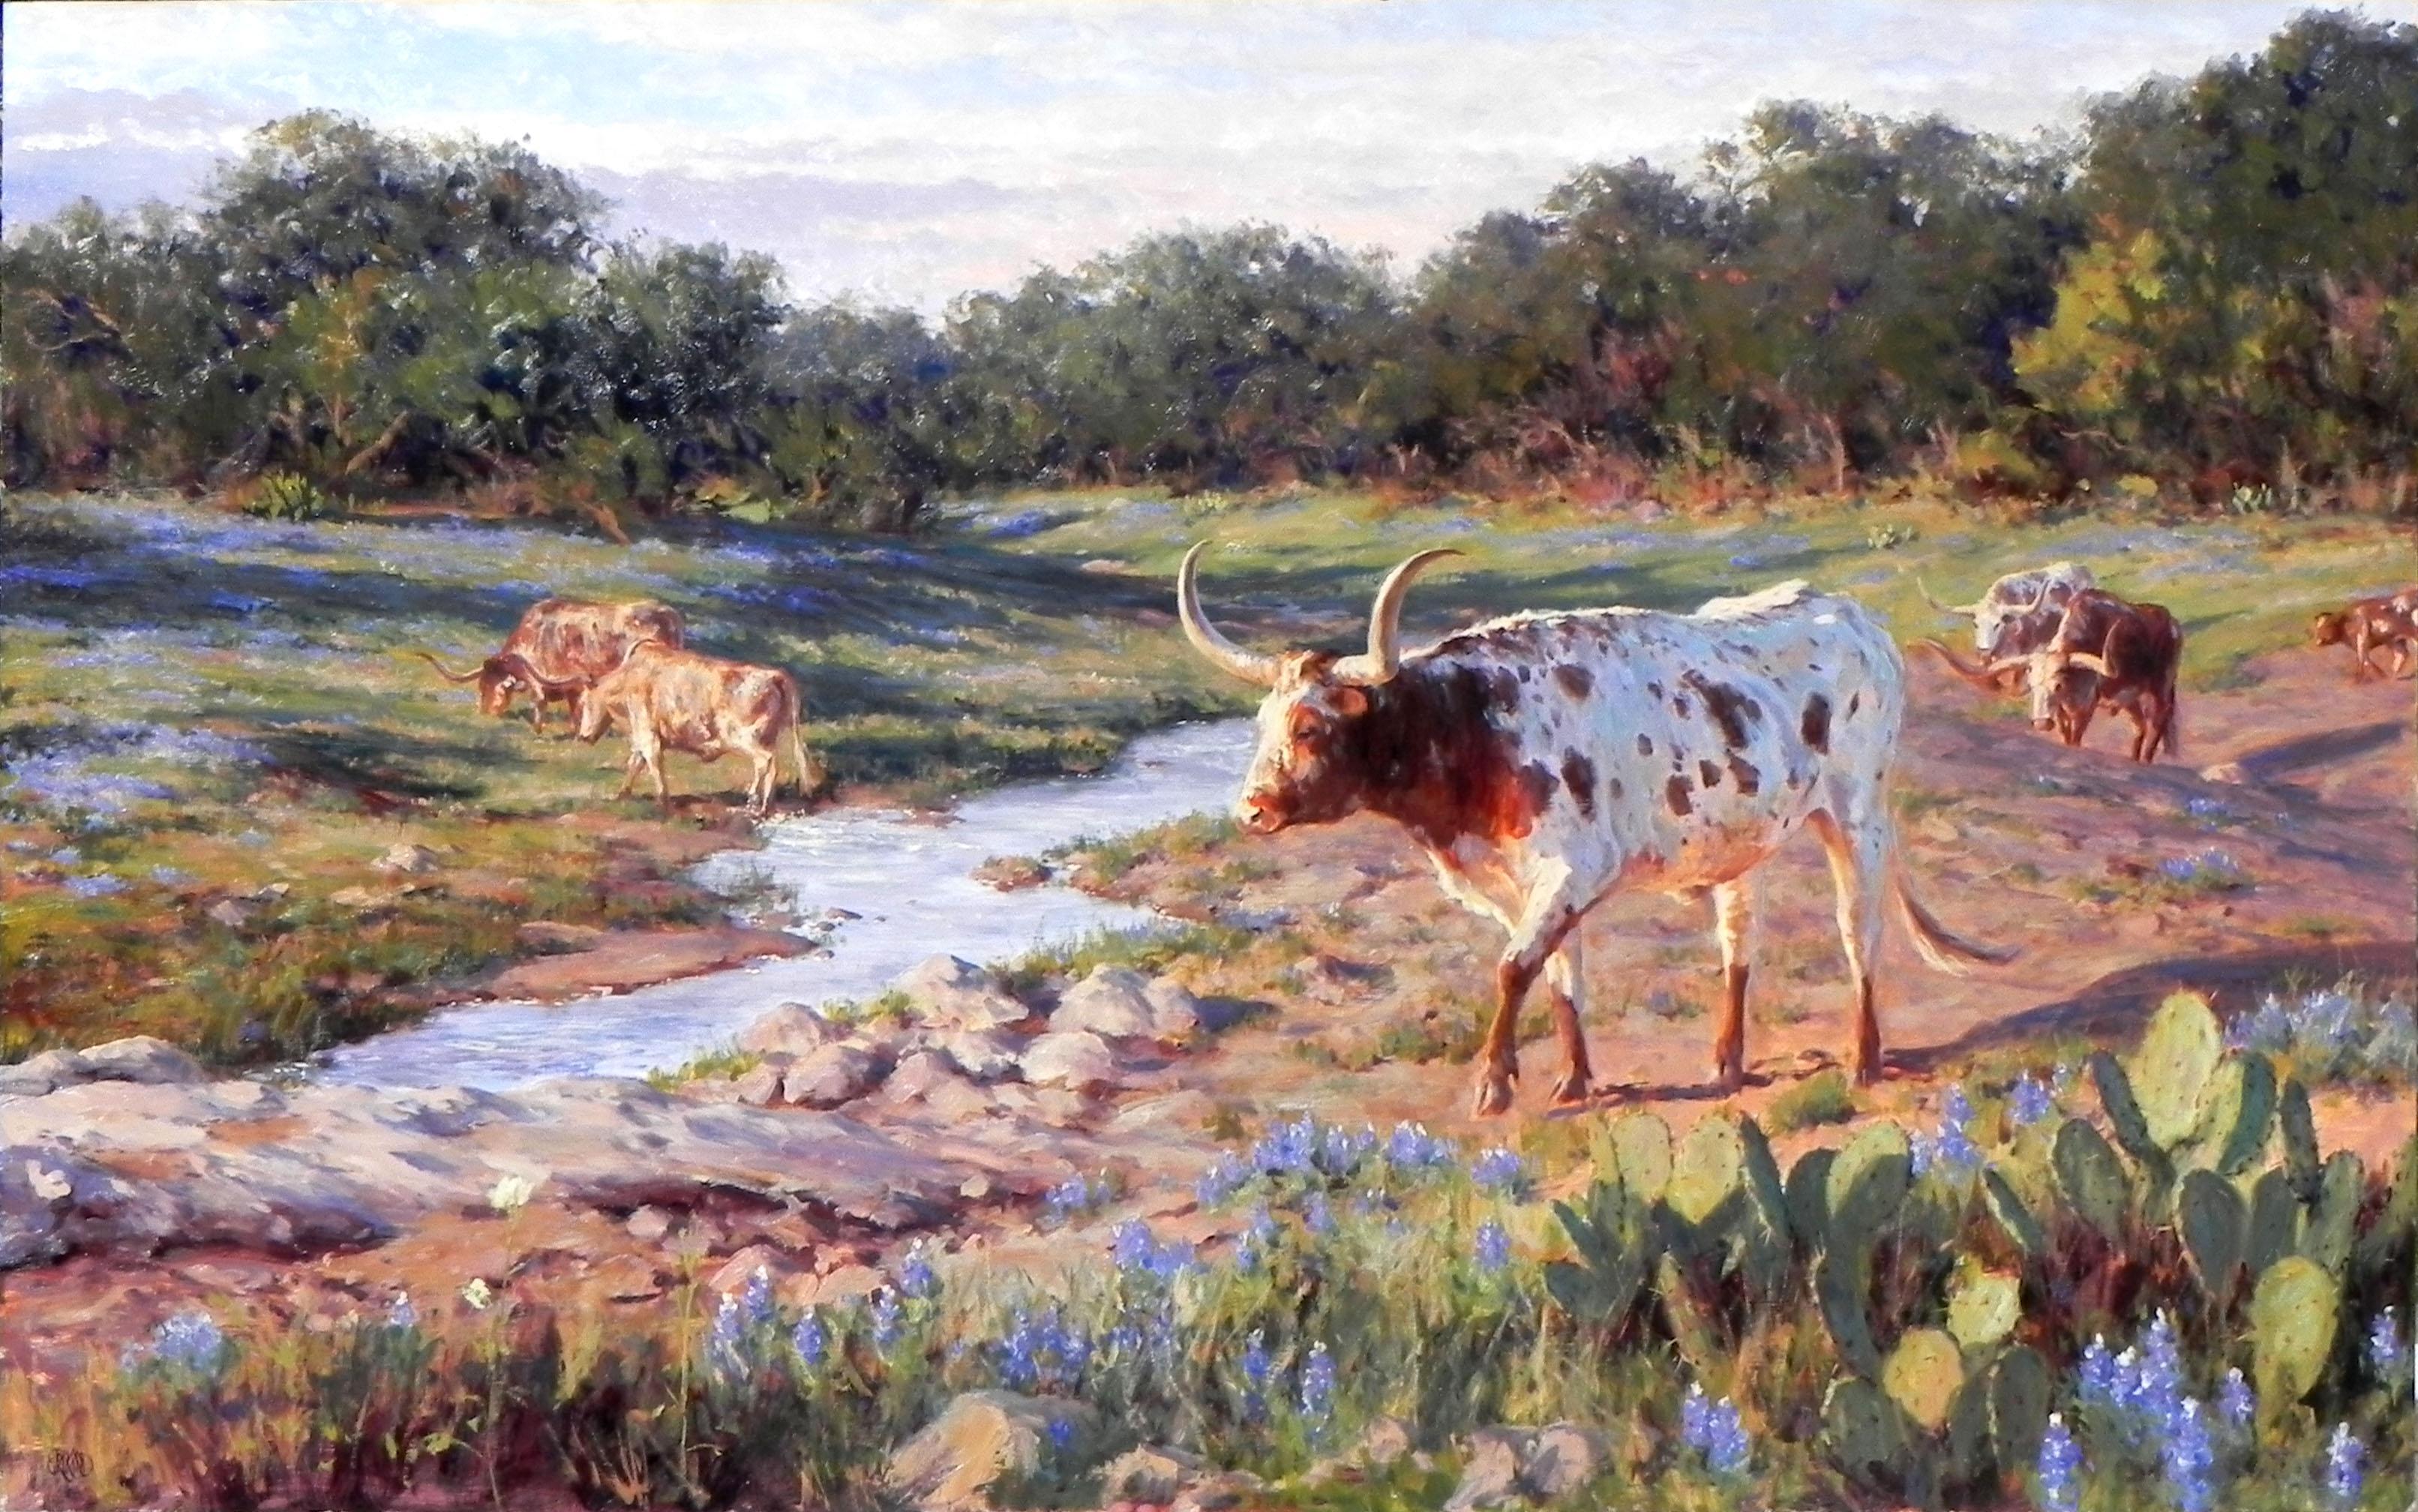 """The Scenic Route"", Brian Grimm, Oil/Canvas, 44x72, Longhorn, Western Landscape"